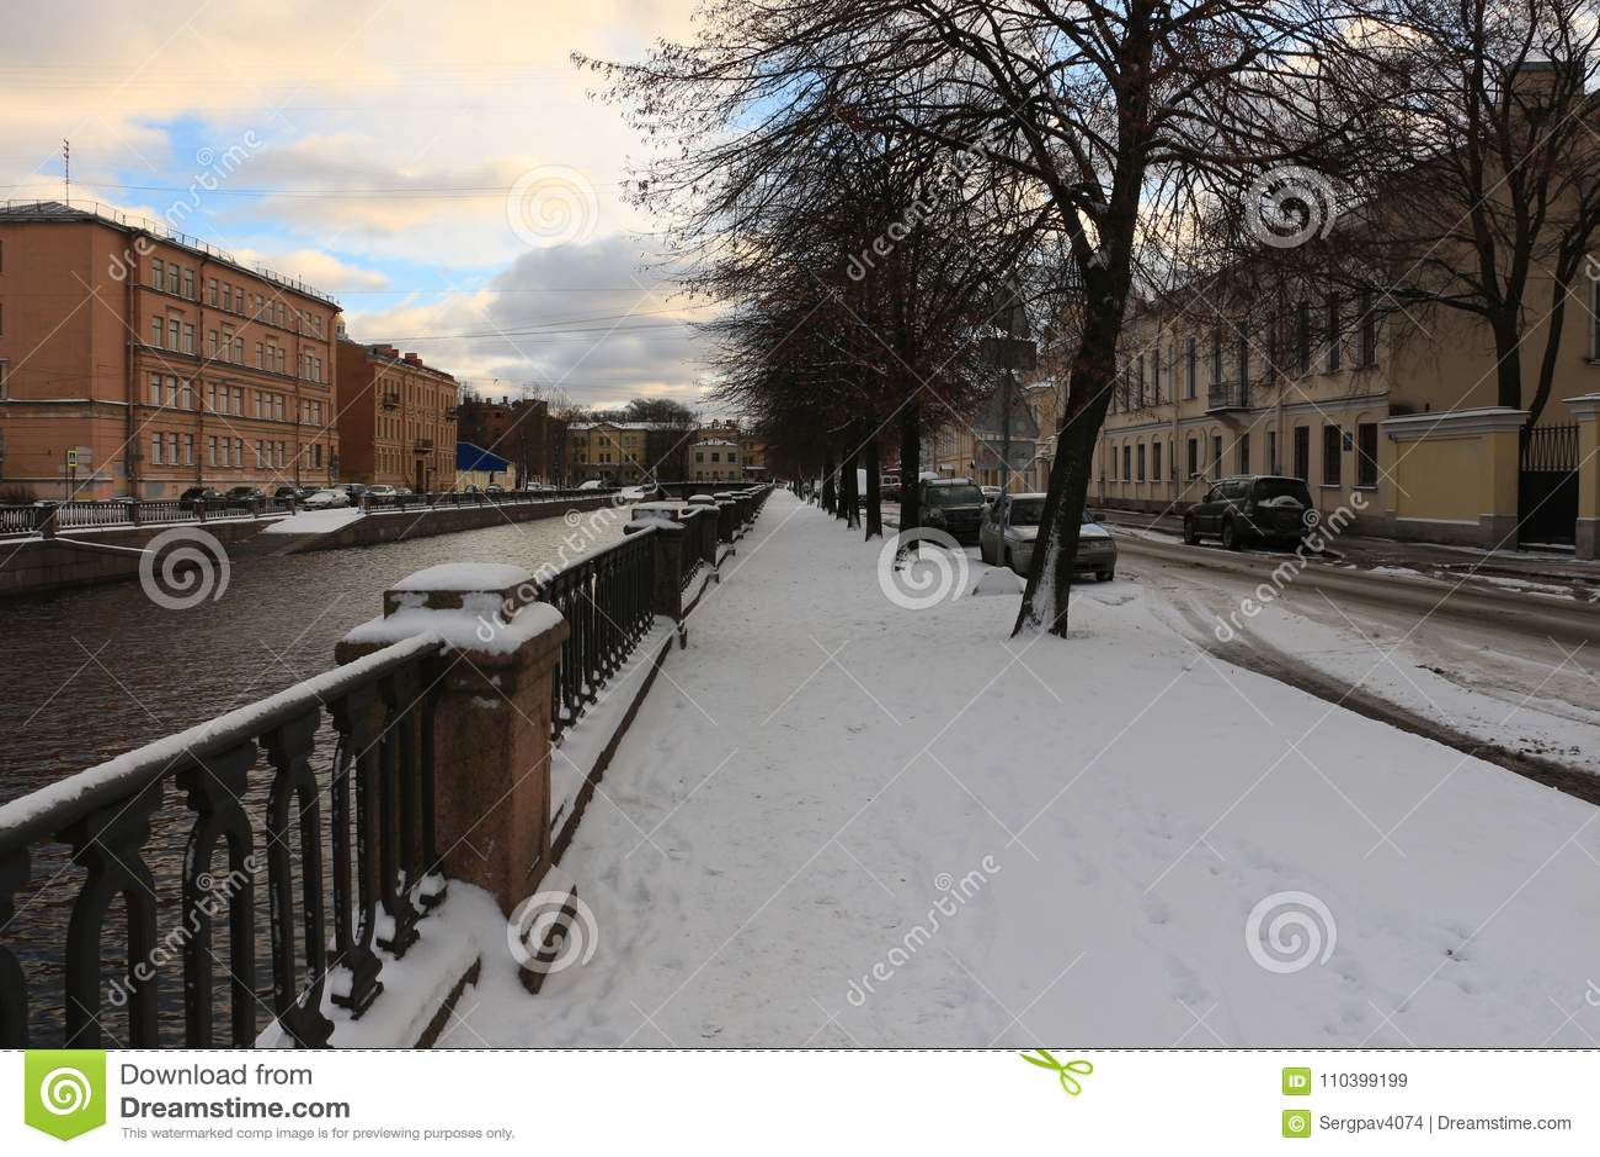 Miasto bulwar na zima dniu